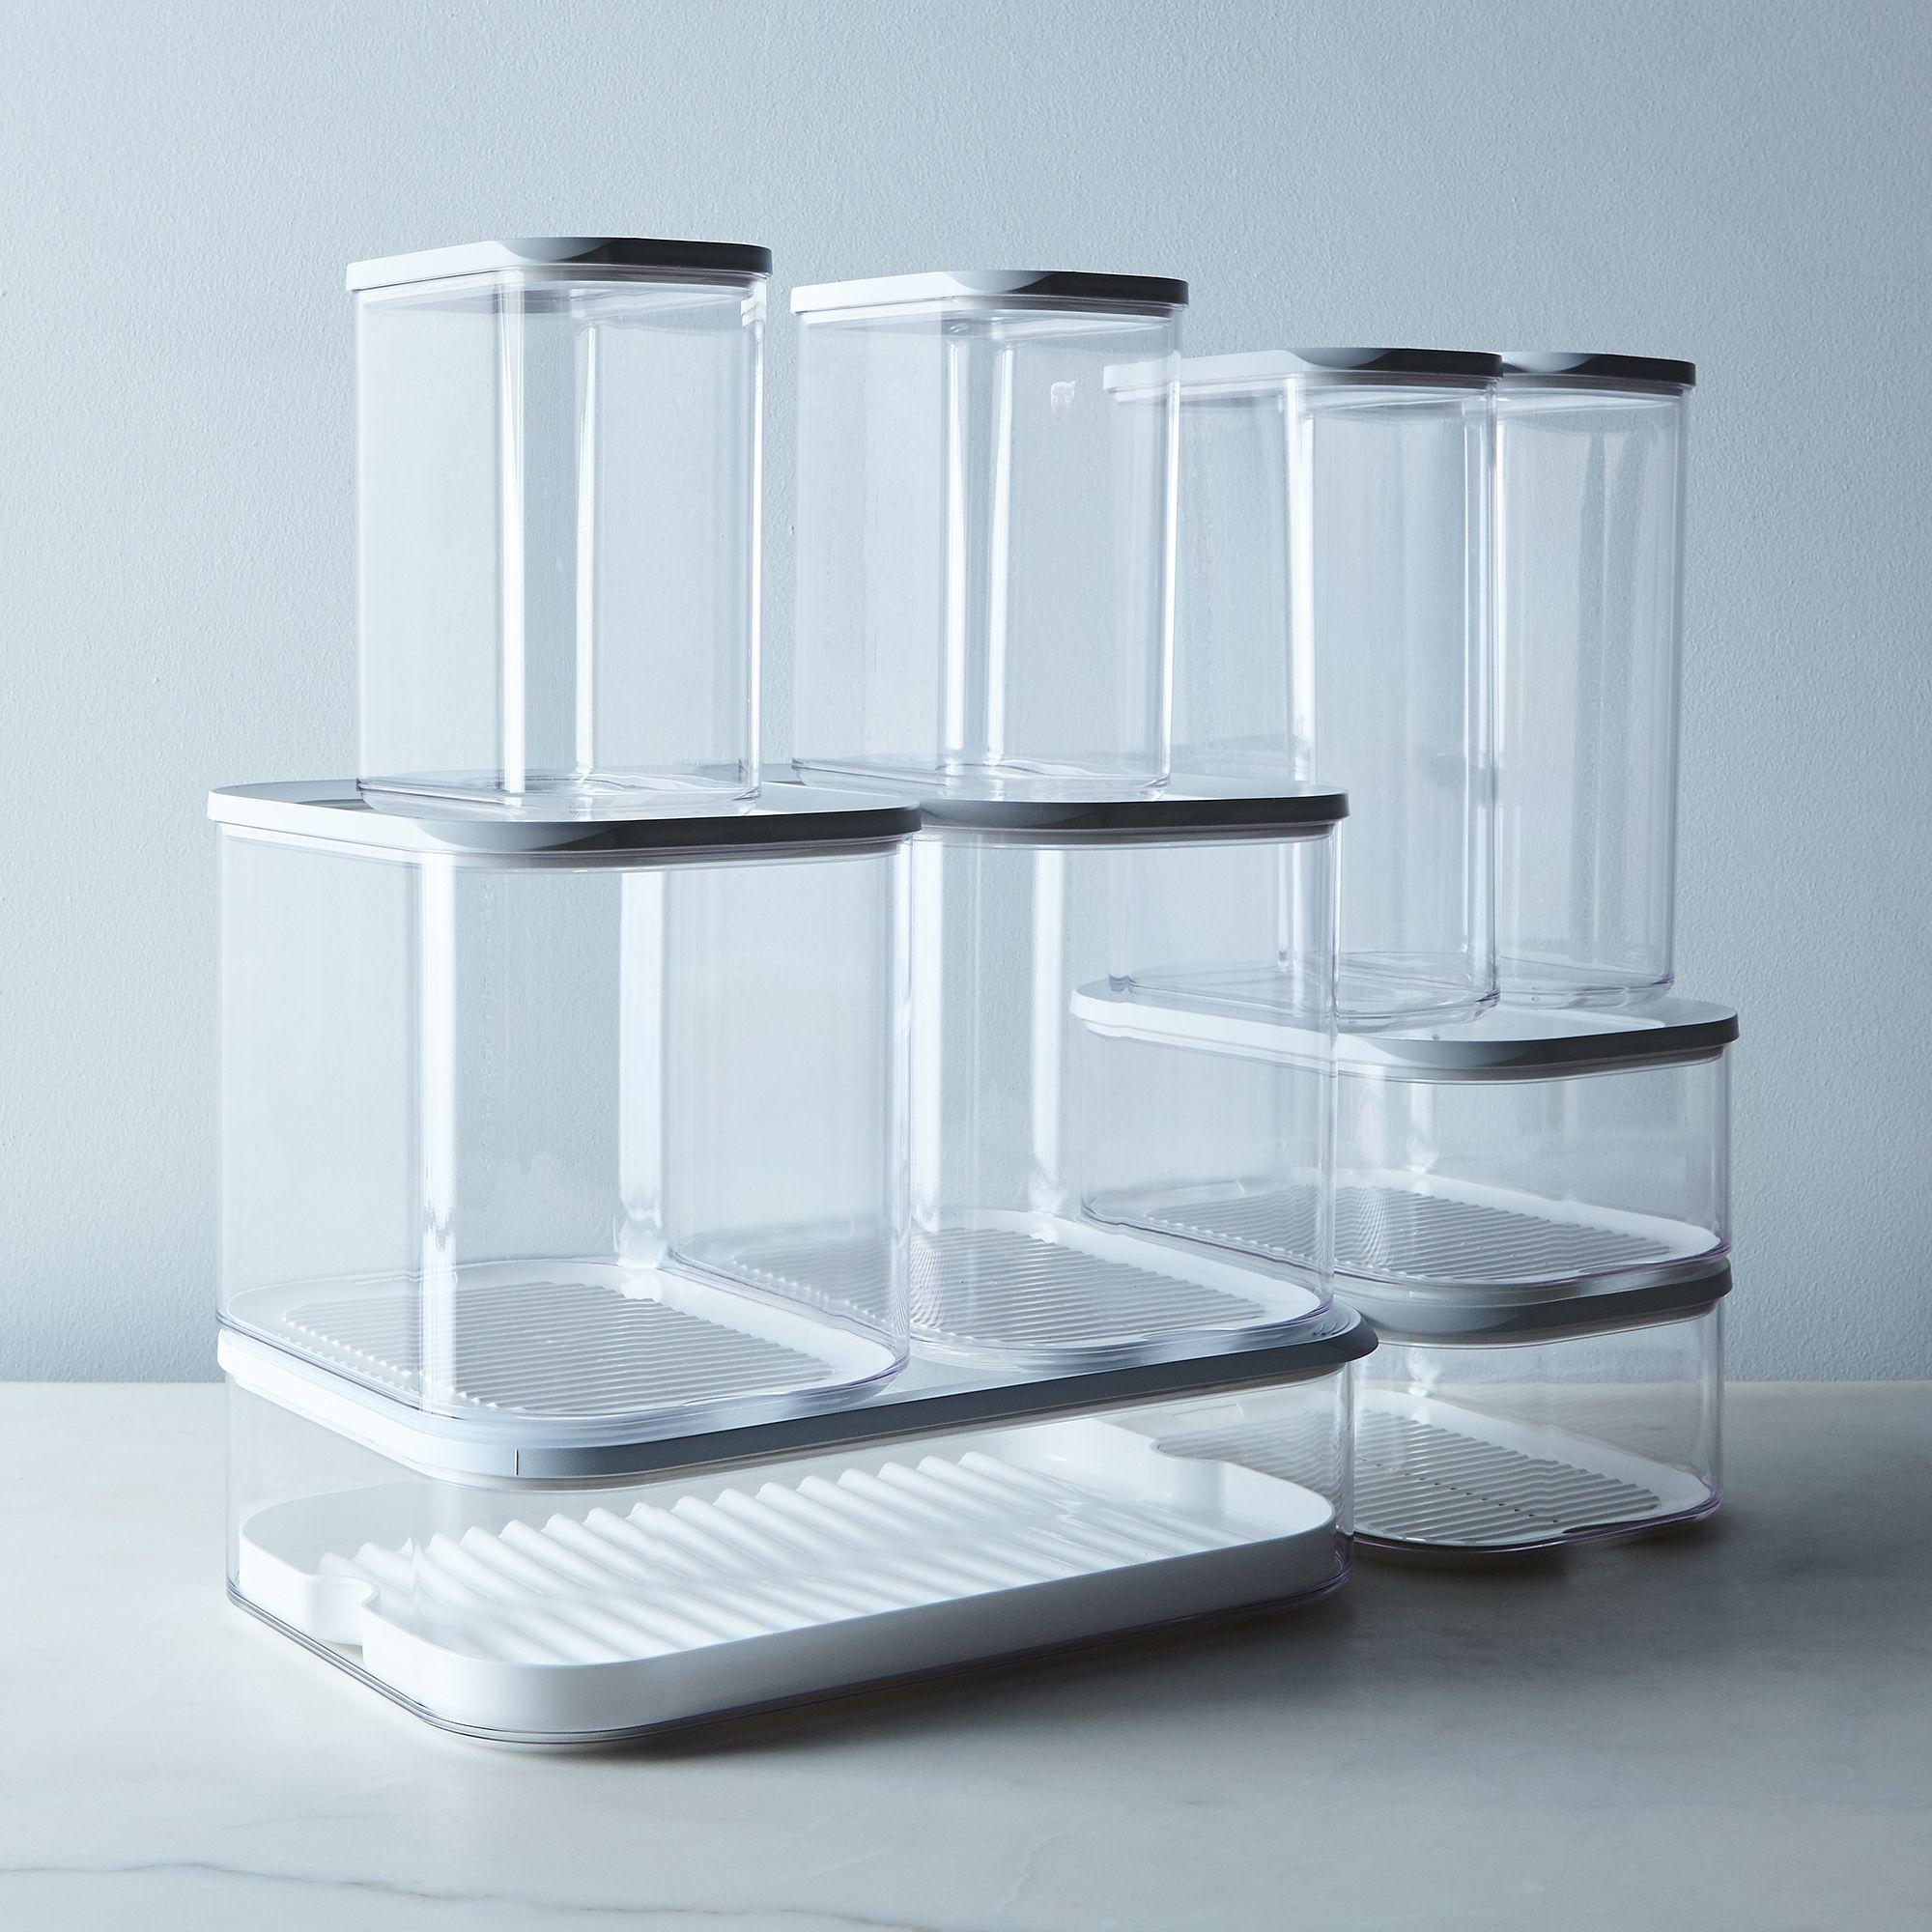 amanda hesser 39 s best tips for a clean organized pantry. Black Bedroom Furniture Sets. Home Design Ideas